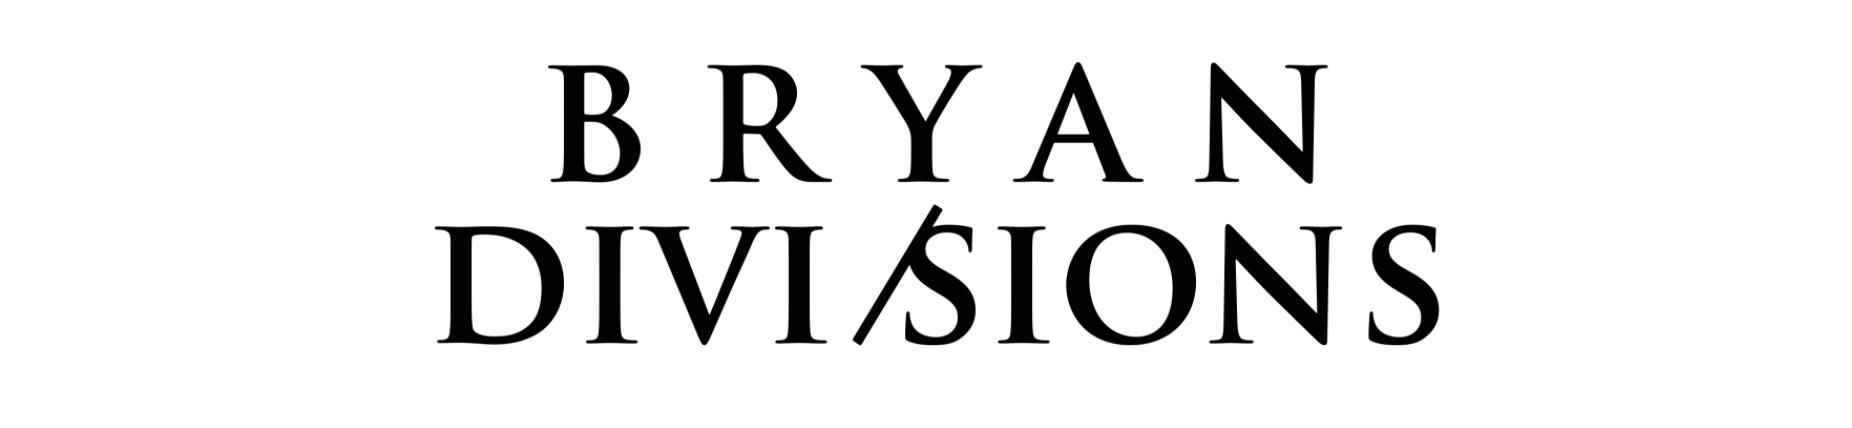 bryan divisions logo wide.png